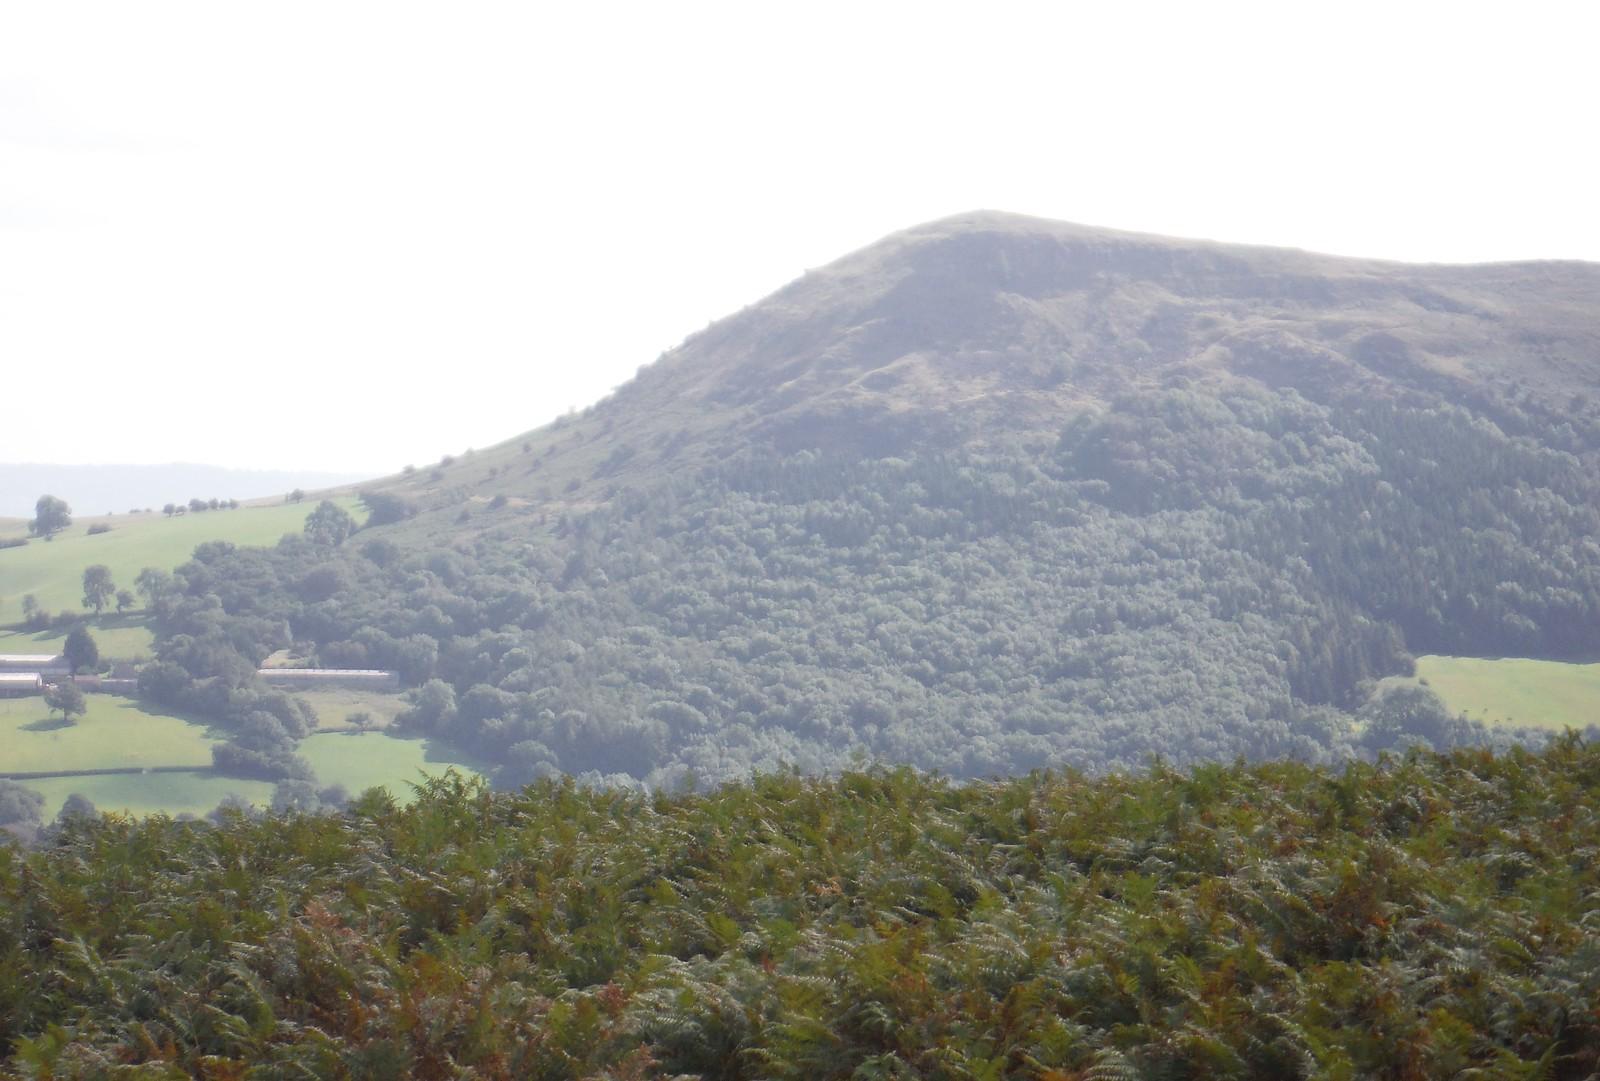 Northerly End of the ridge of The Skirrid, from Bryn Arw SWC Walk 347 - Llanvihangel Crucorney Circular (via Bryn Arw and The Skirrid)